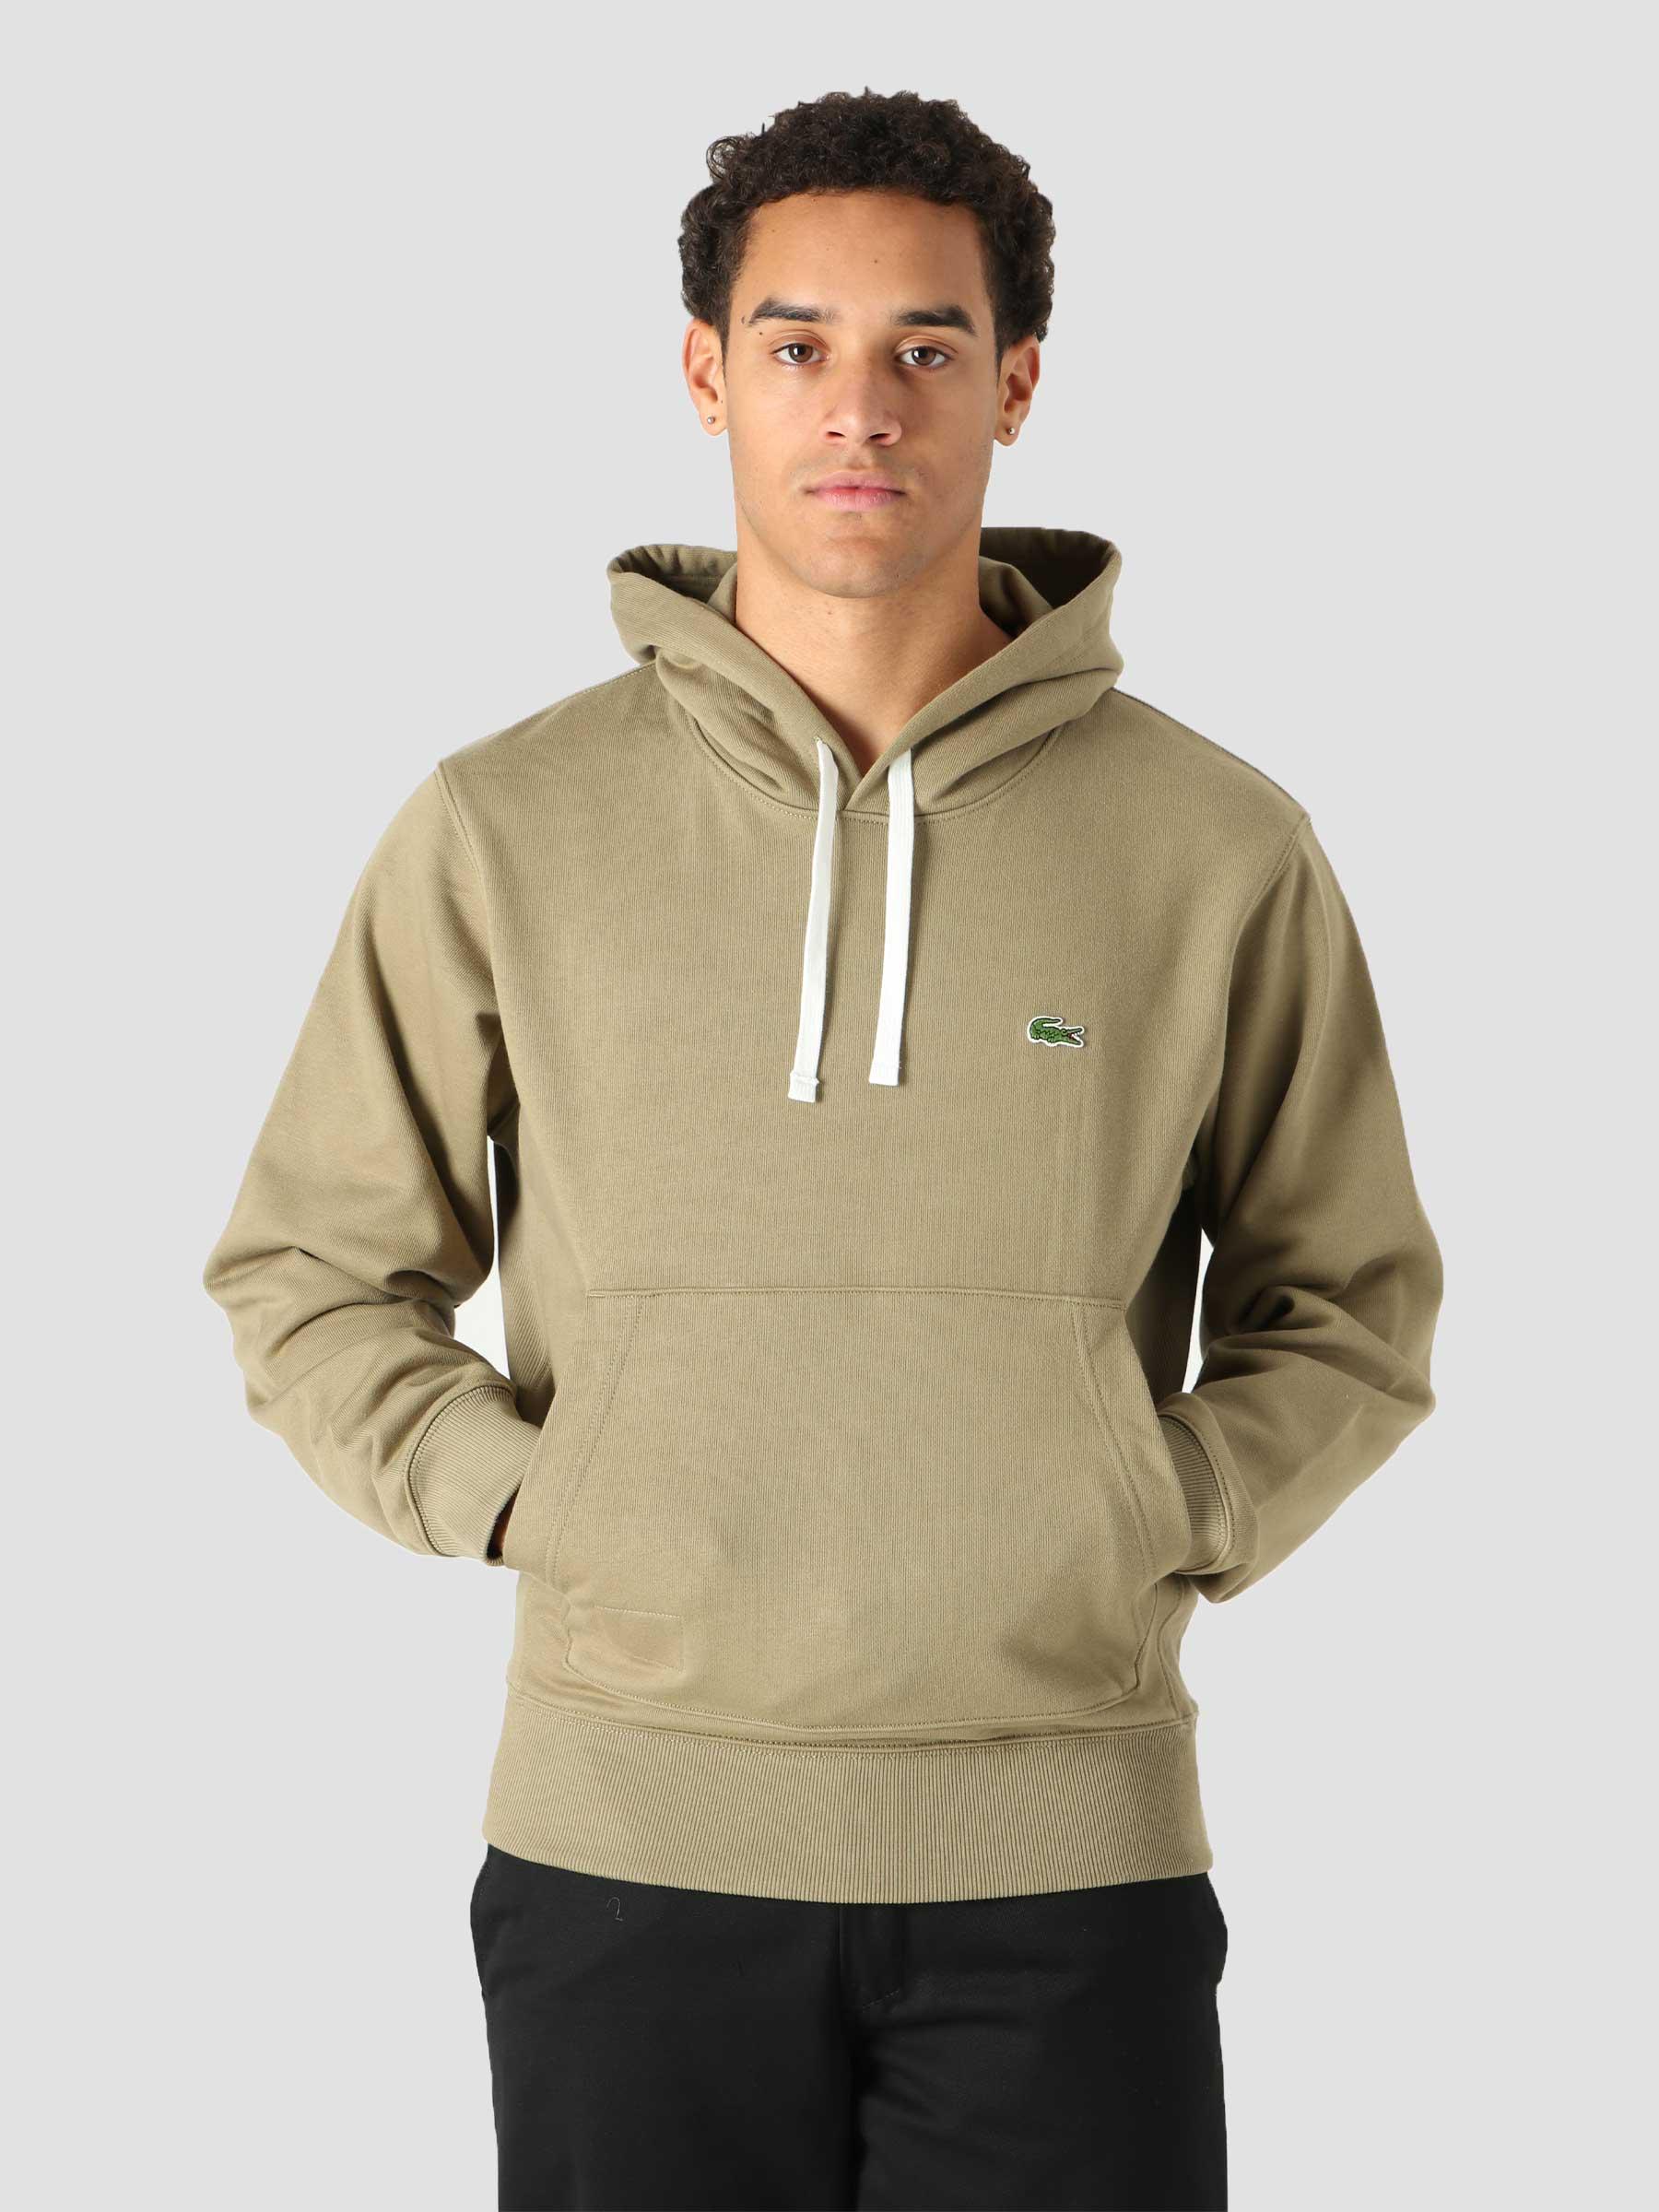 1HS1 Men's Sweatshirt 07 Aloe SH1701-13